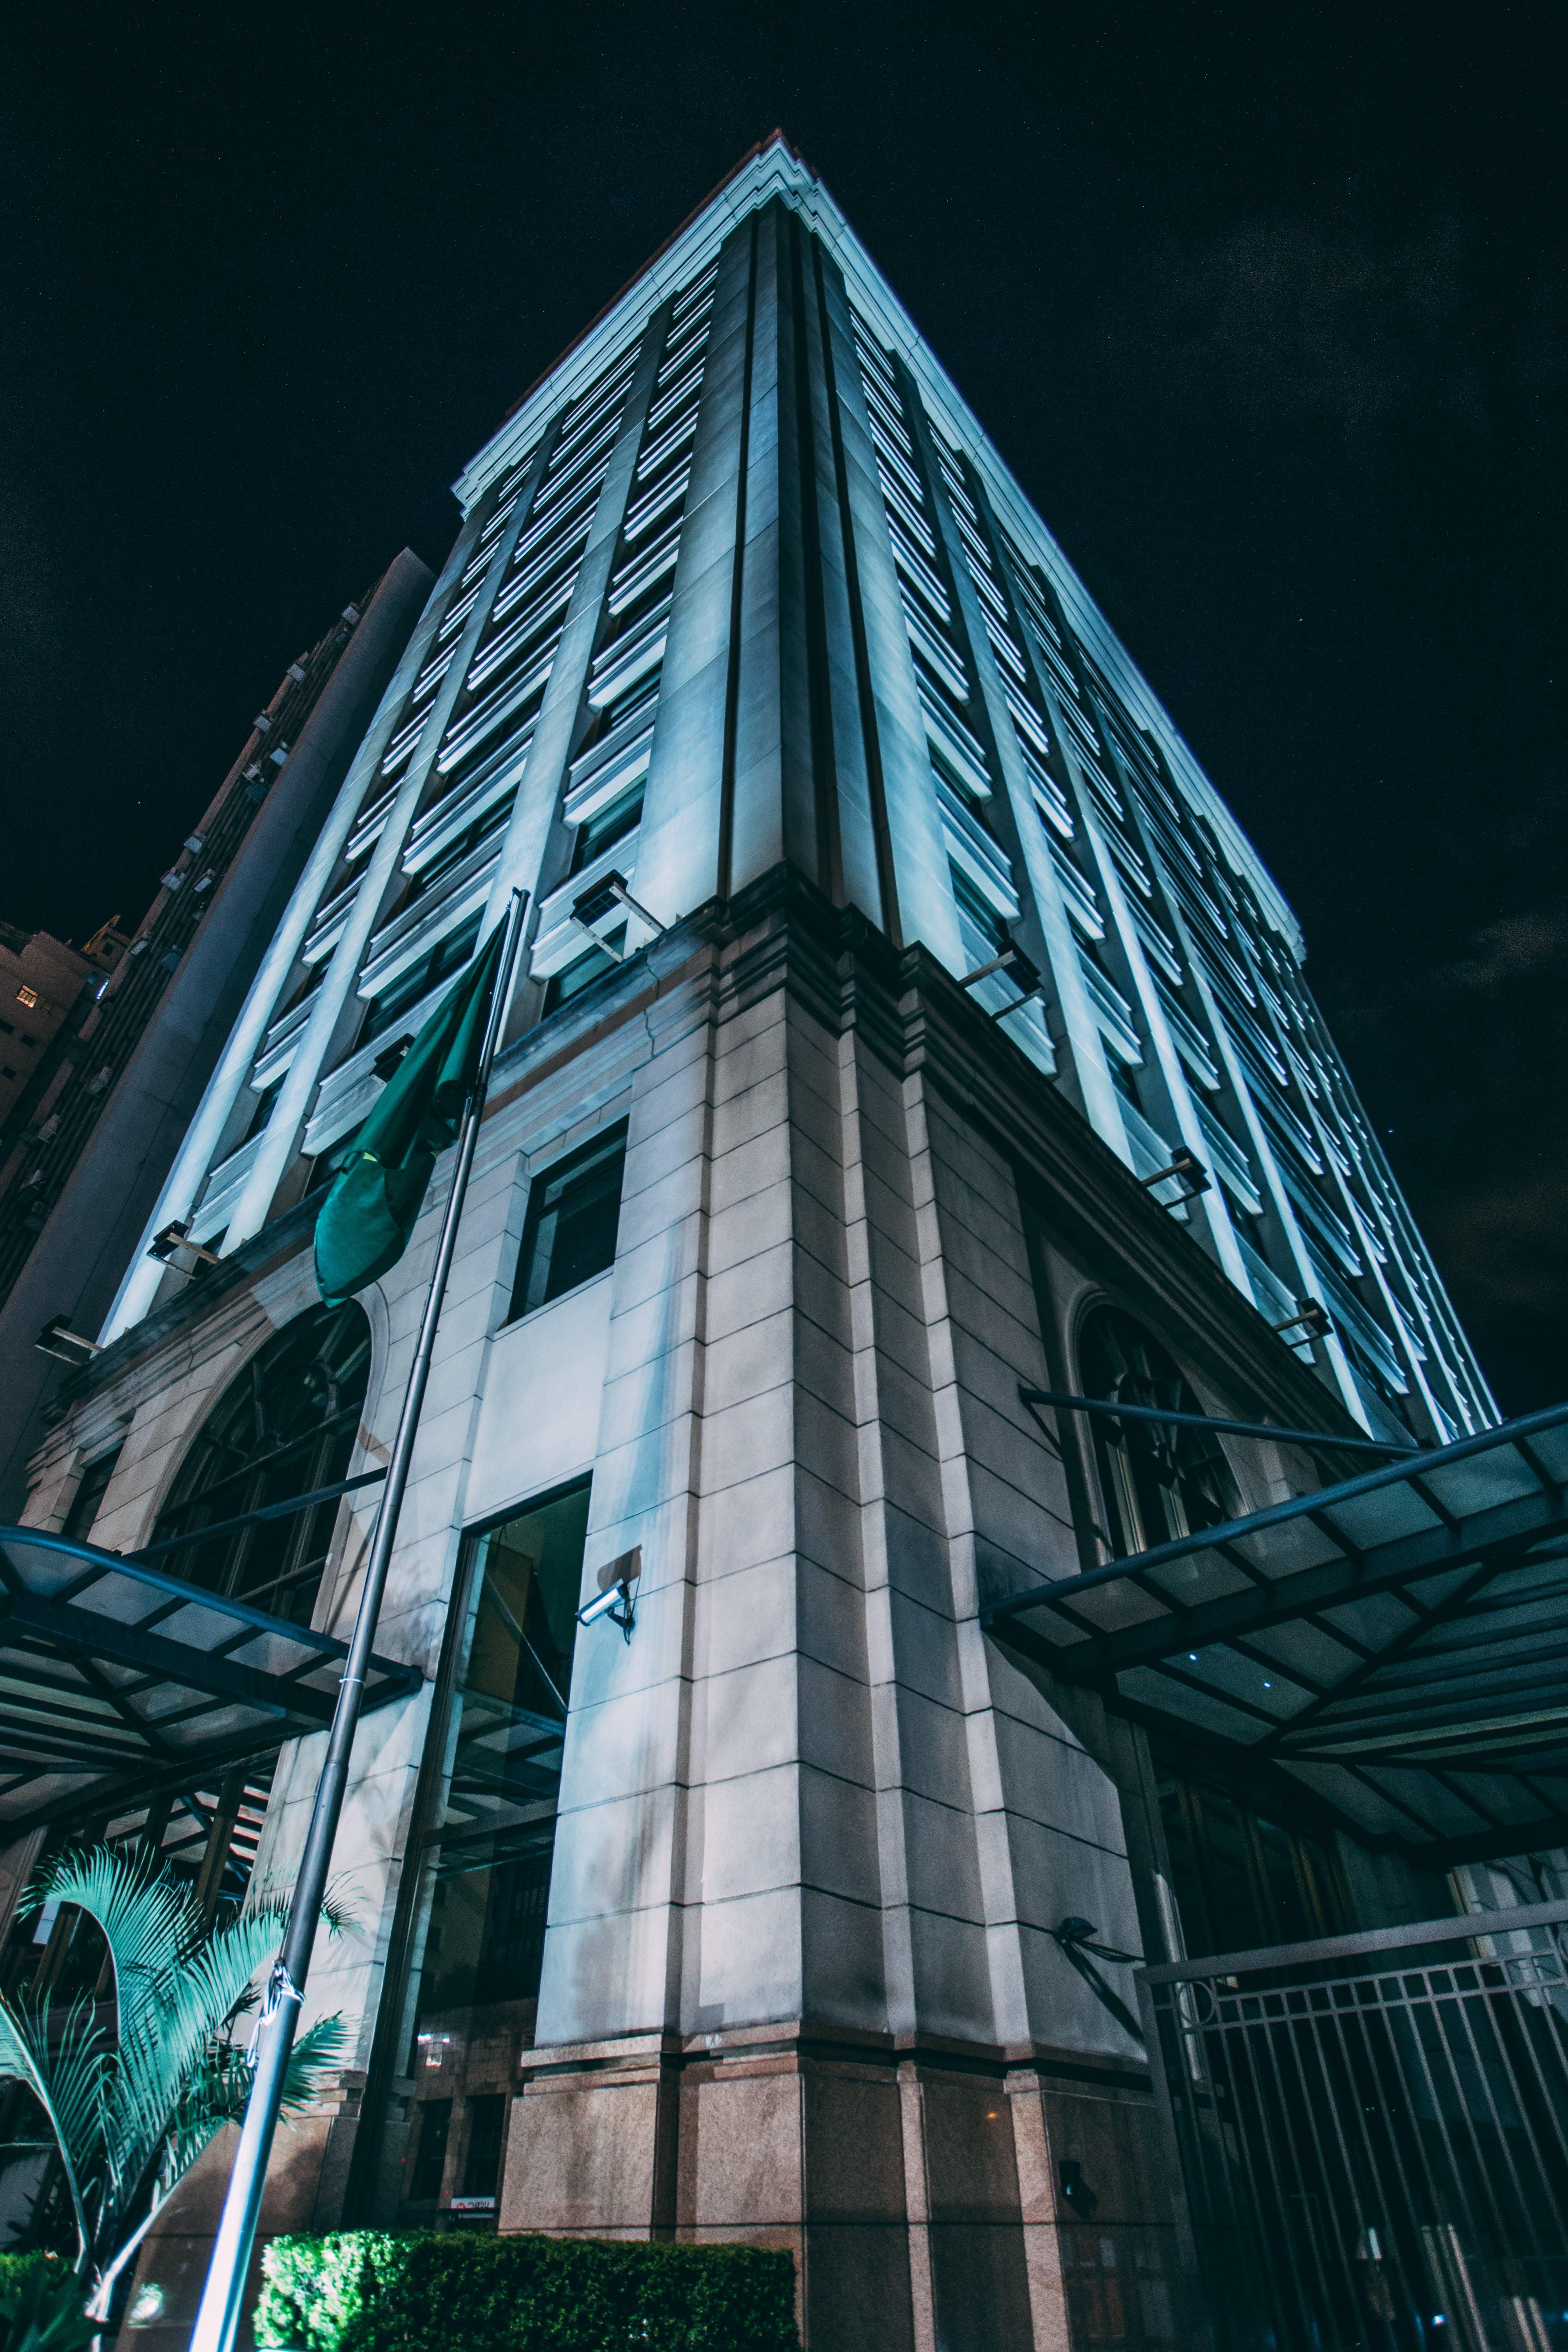 Bottom View of Concrete Building